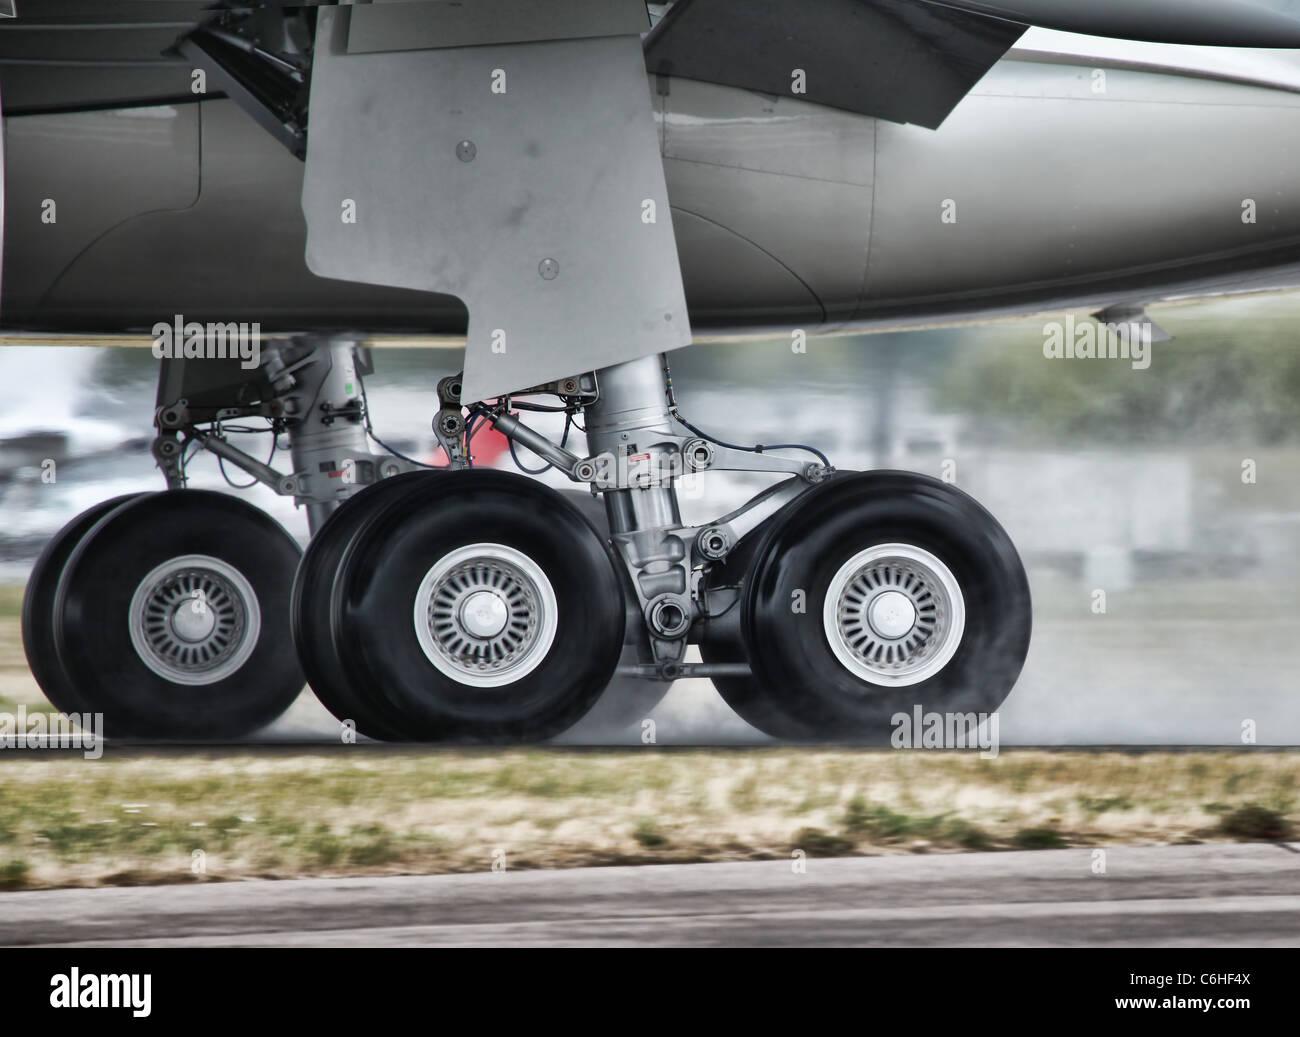 Aircraft Landing on a Wet Runway - Stock Image